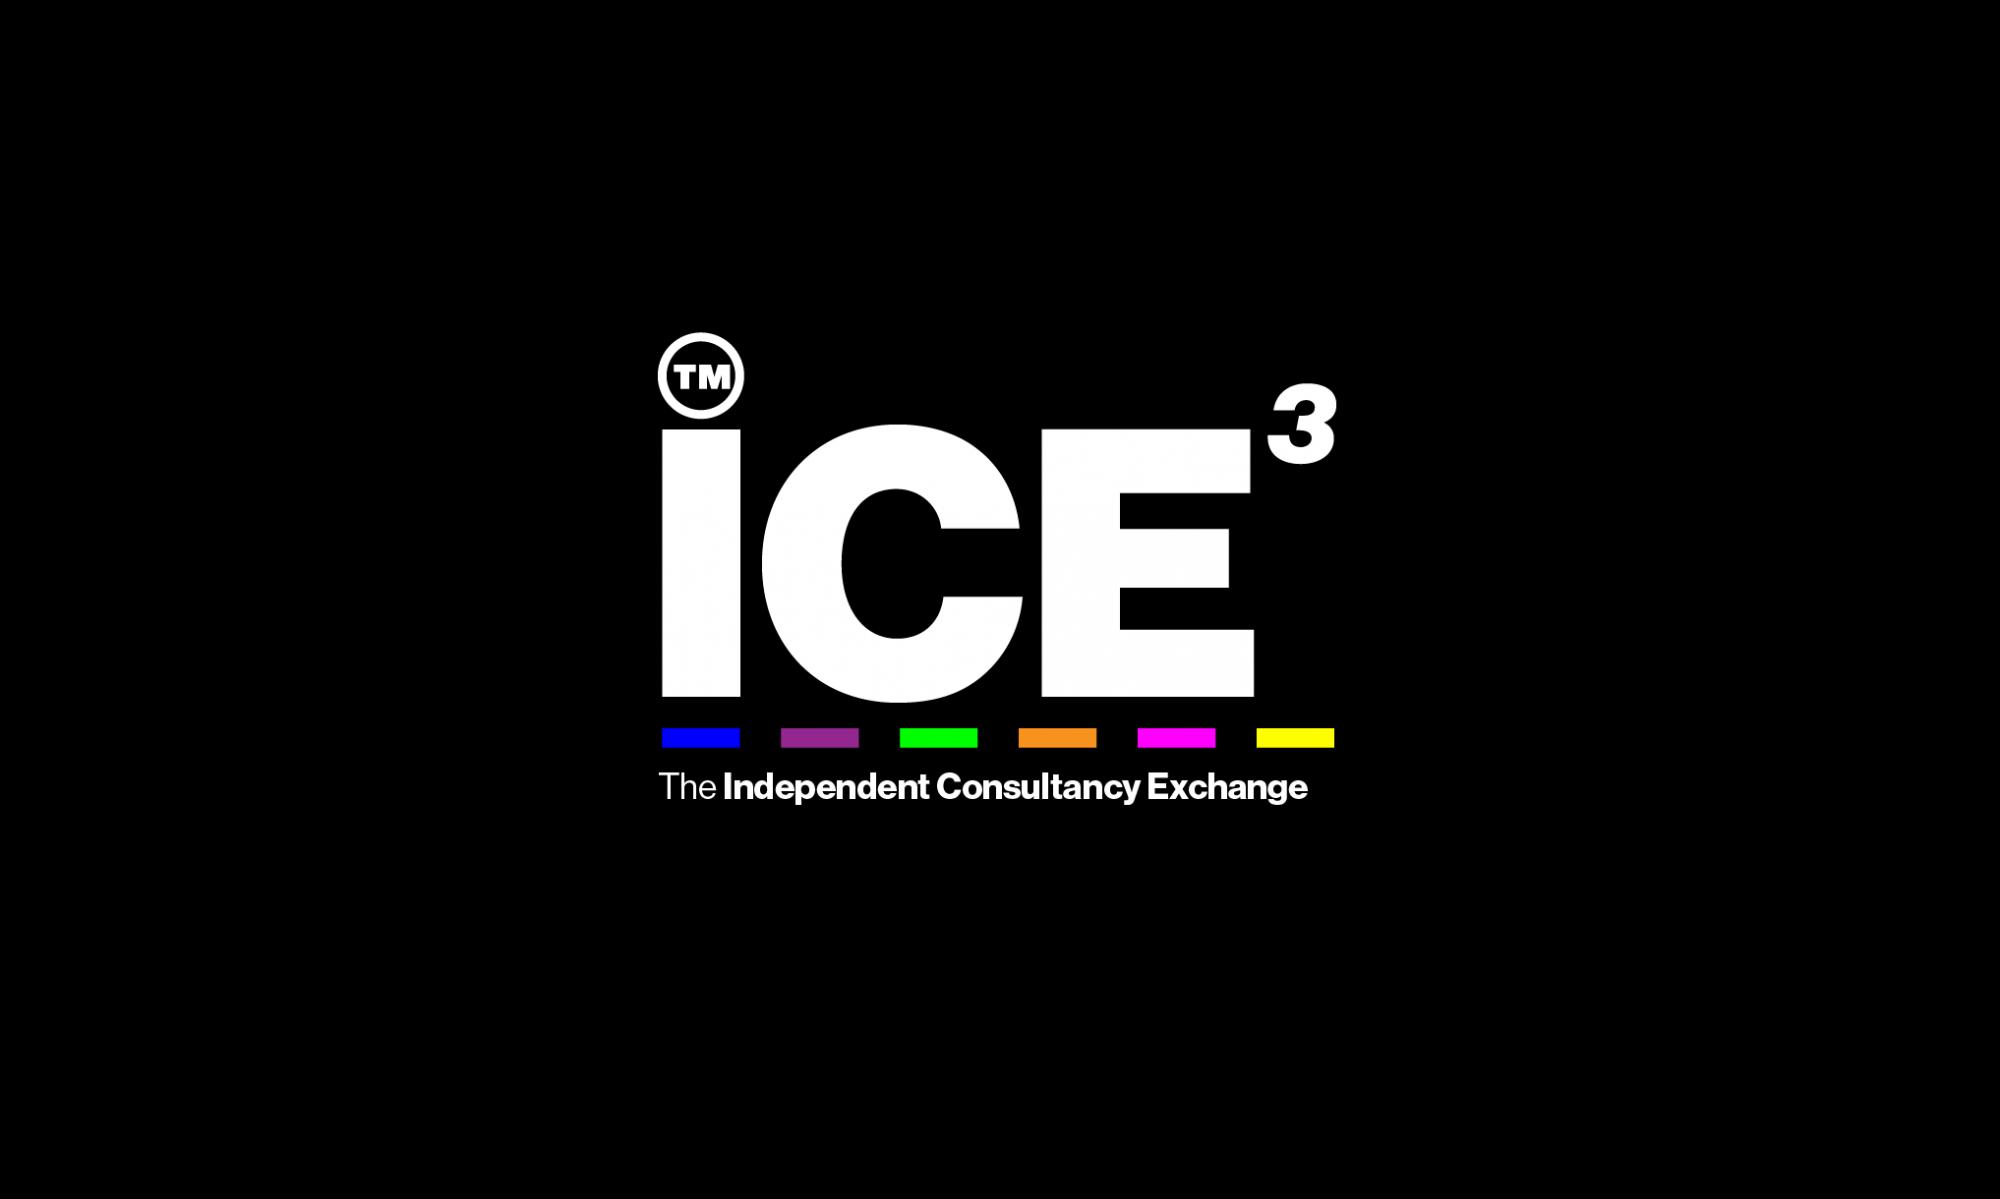 icecubed.biz